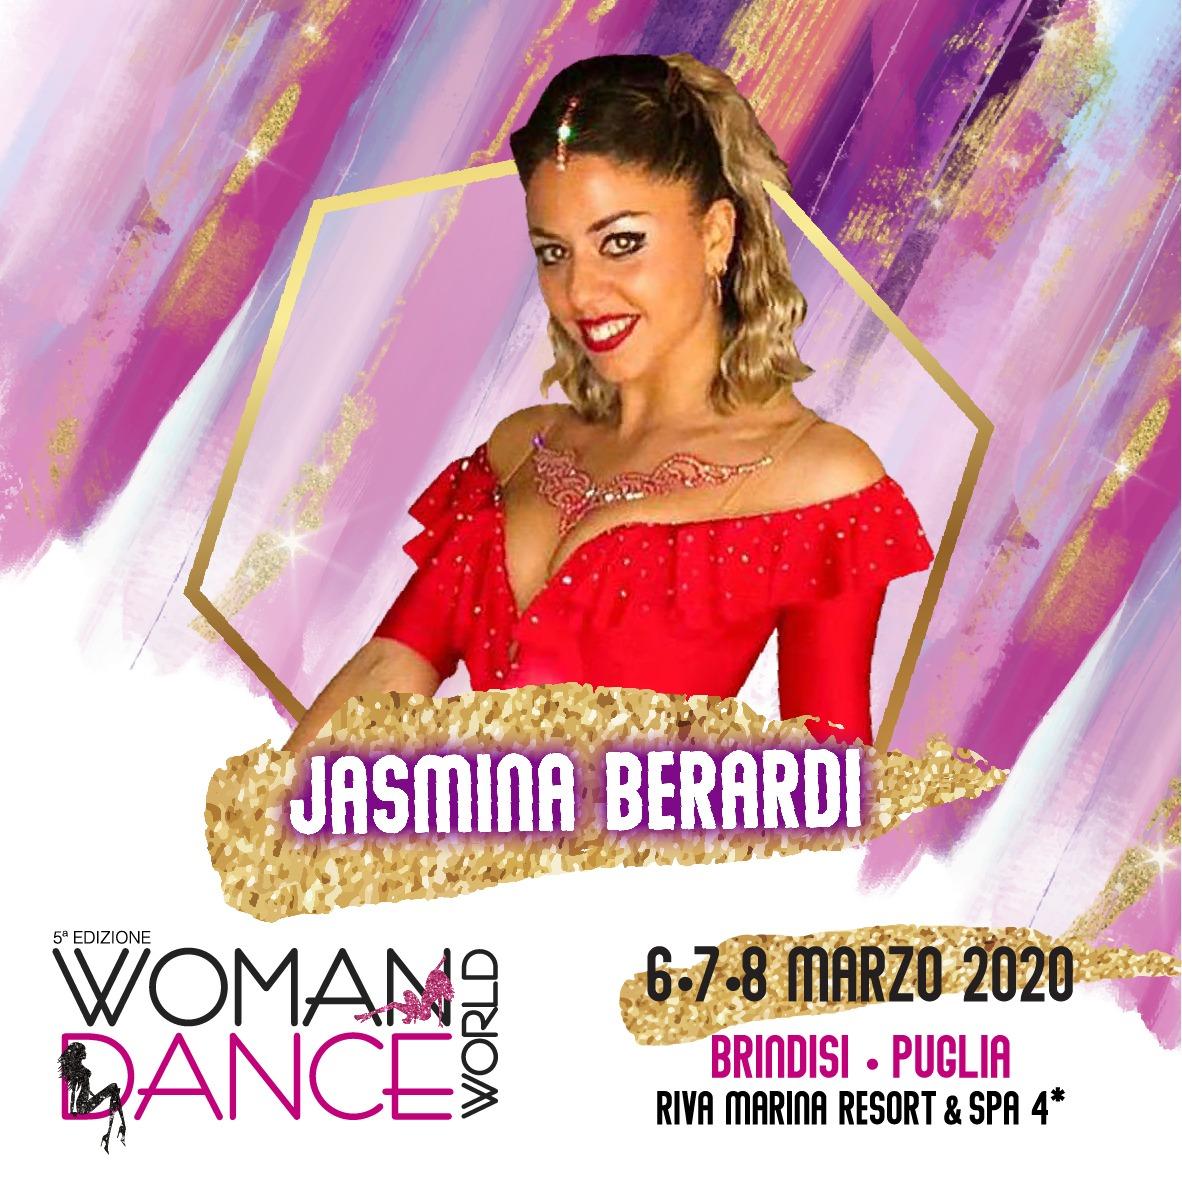 Jasmina Berardi